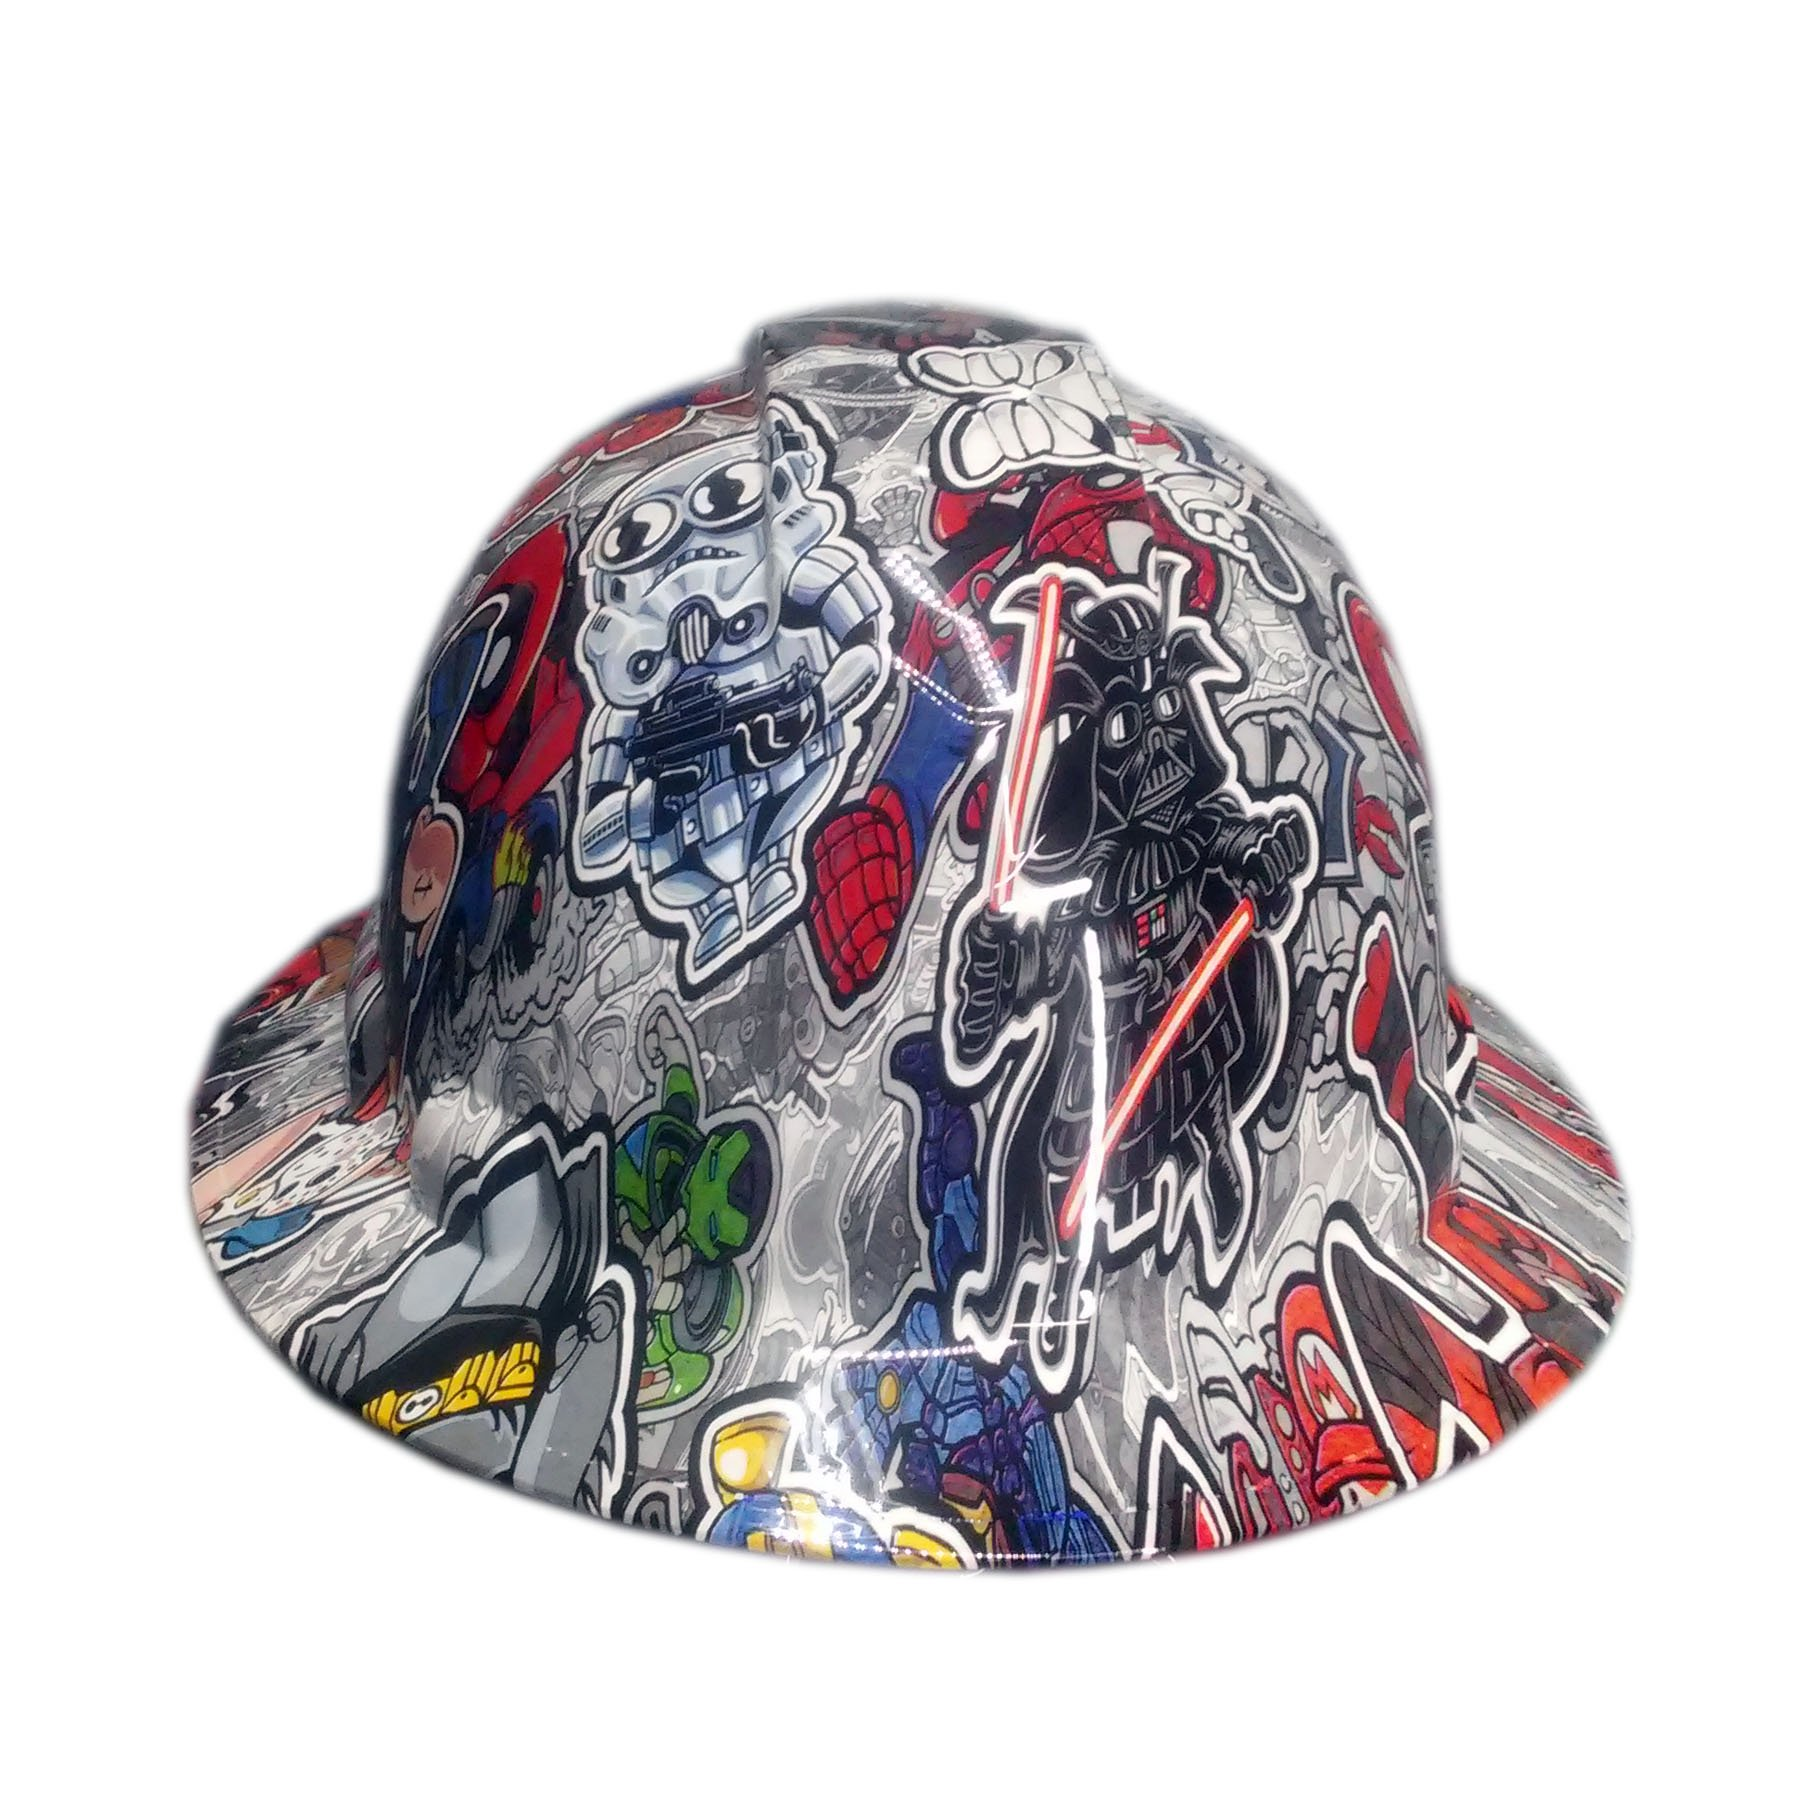 Izzo Graphics Twisted Toons Pyramex Ridgeline Full Brim Hard Hat